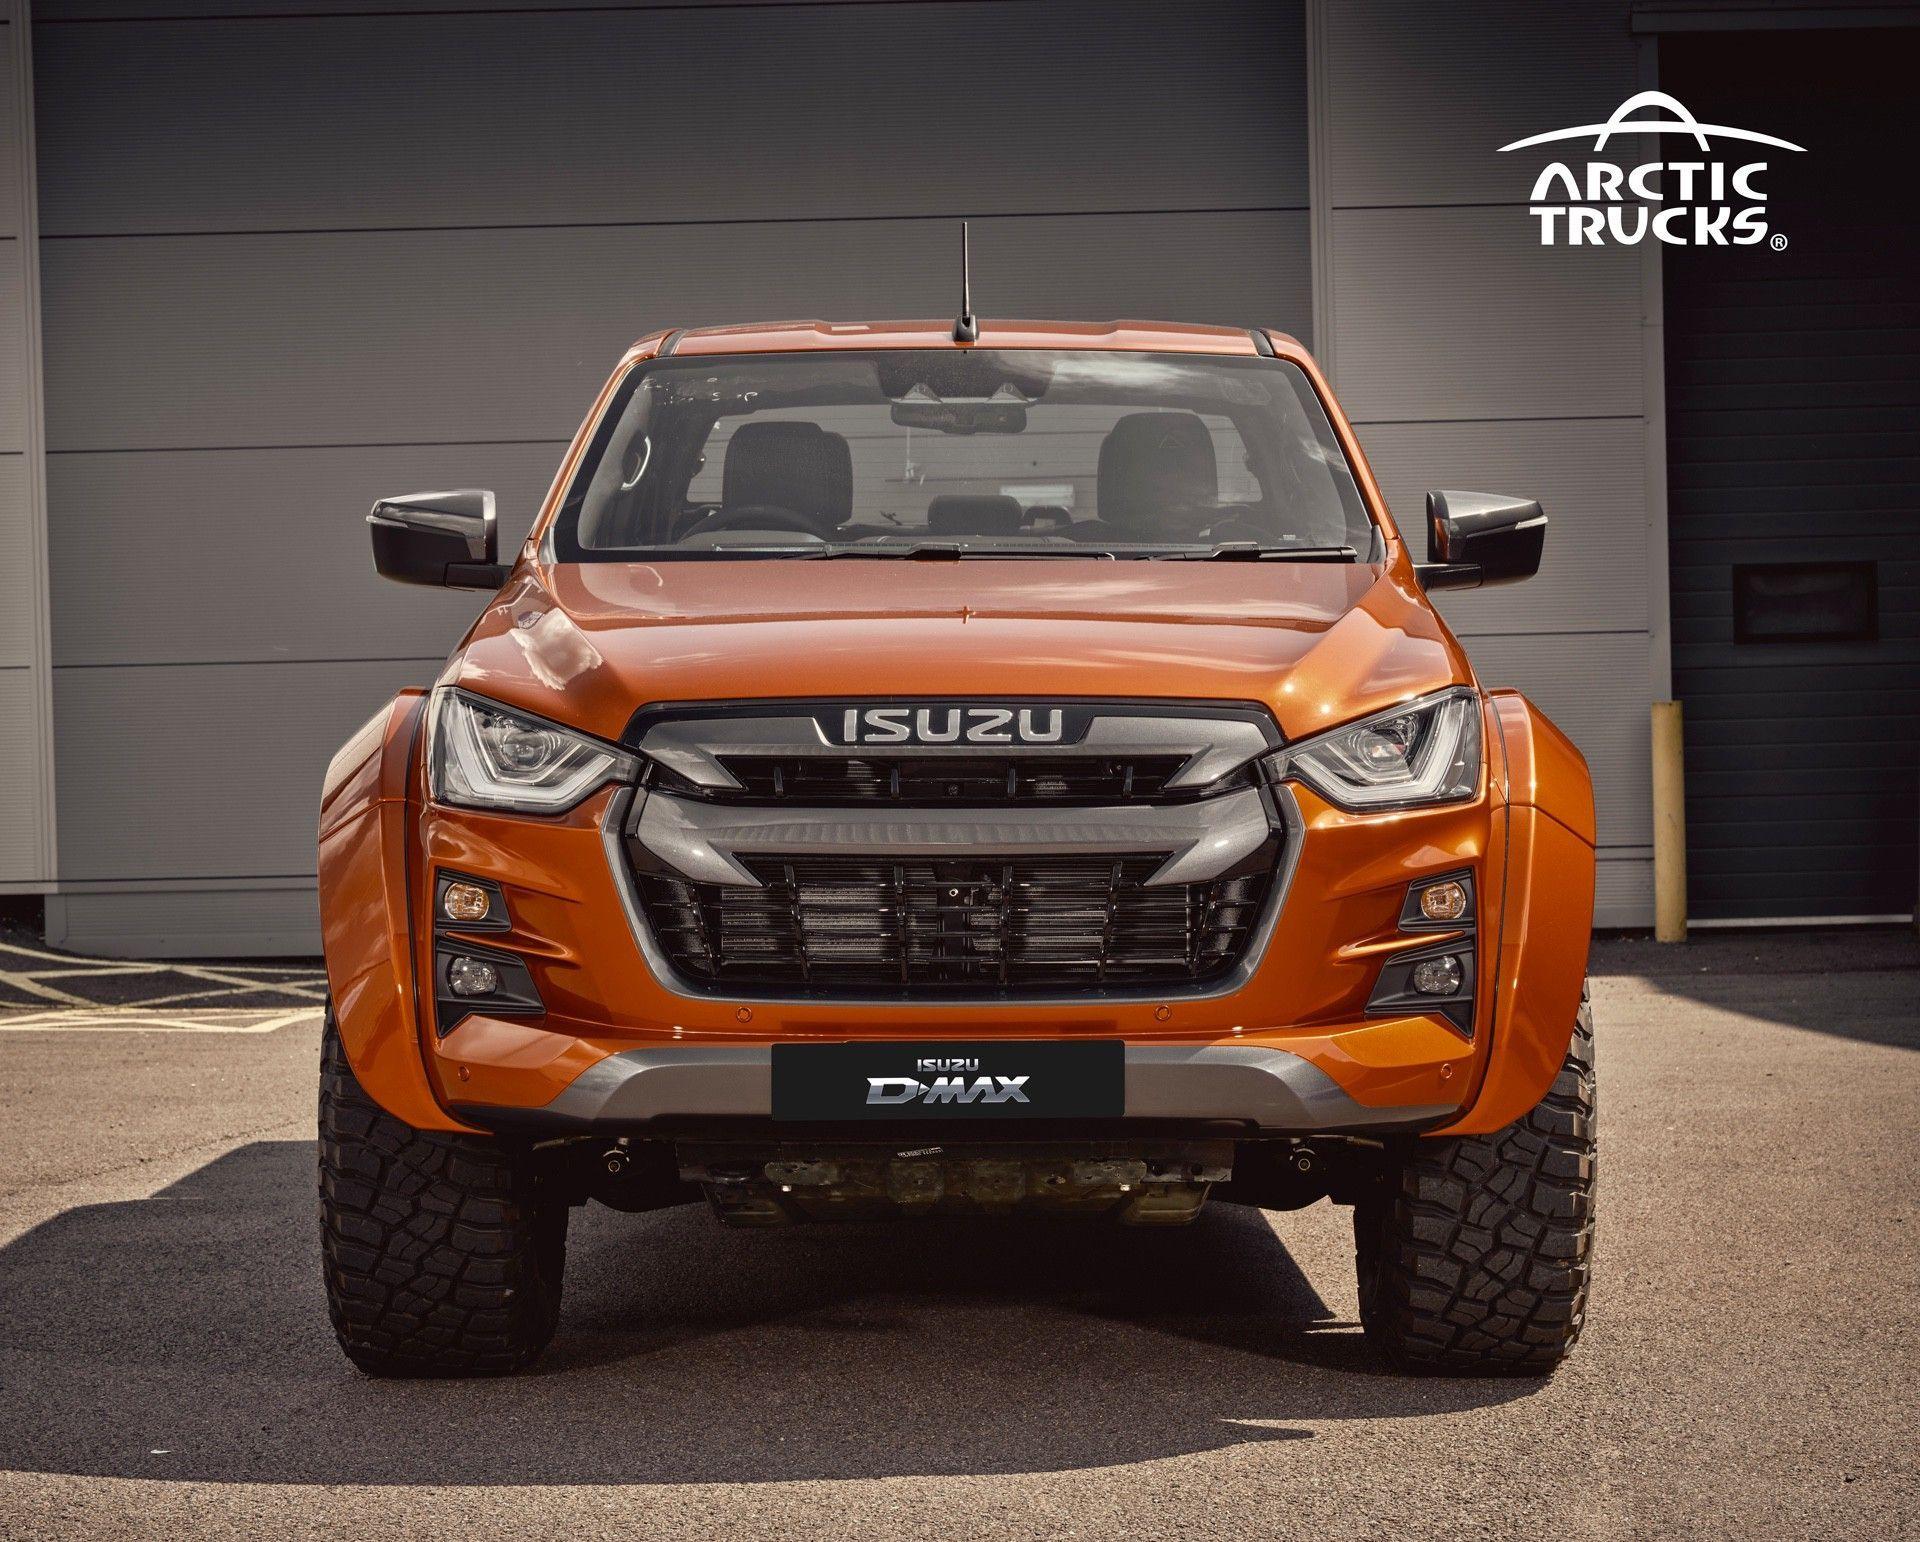 2022_Isuzu_D-Max_Arctic_Trucks_AT35-0003